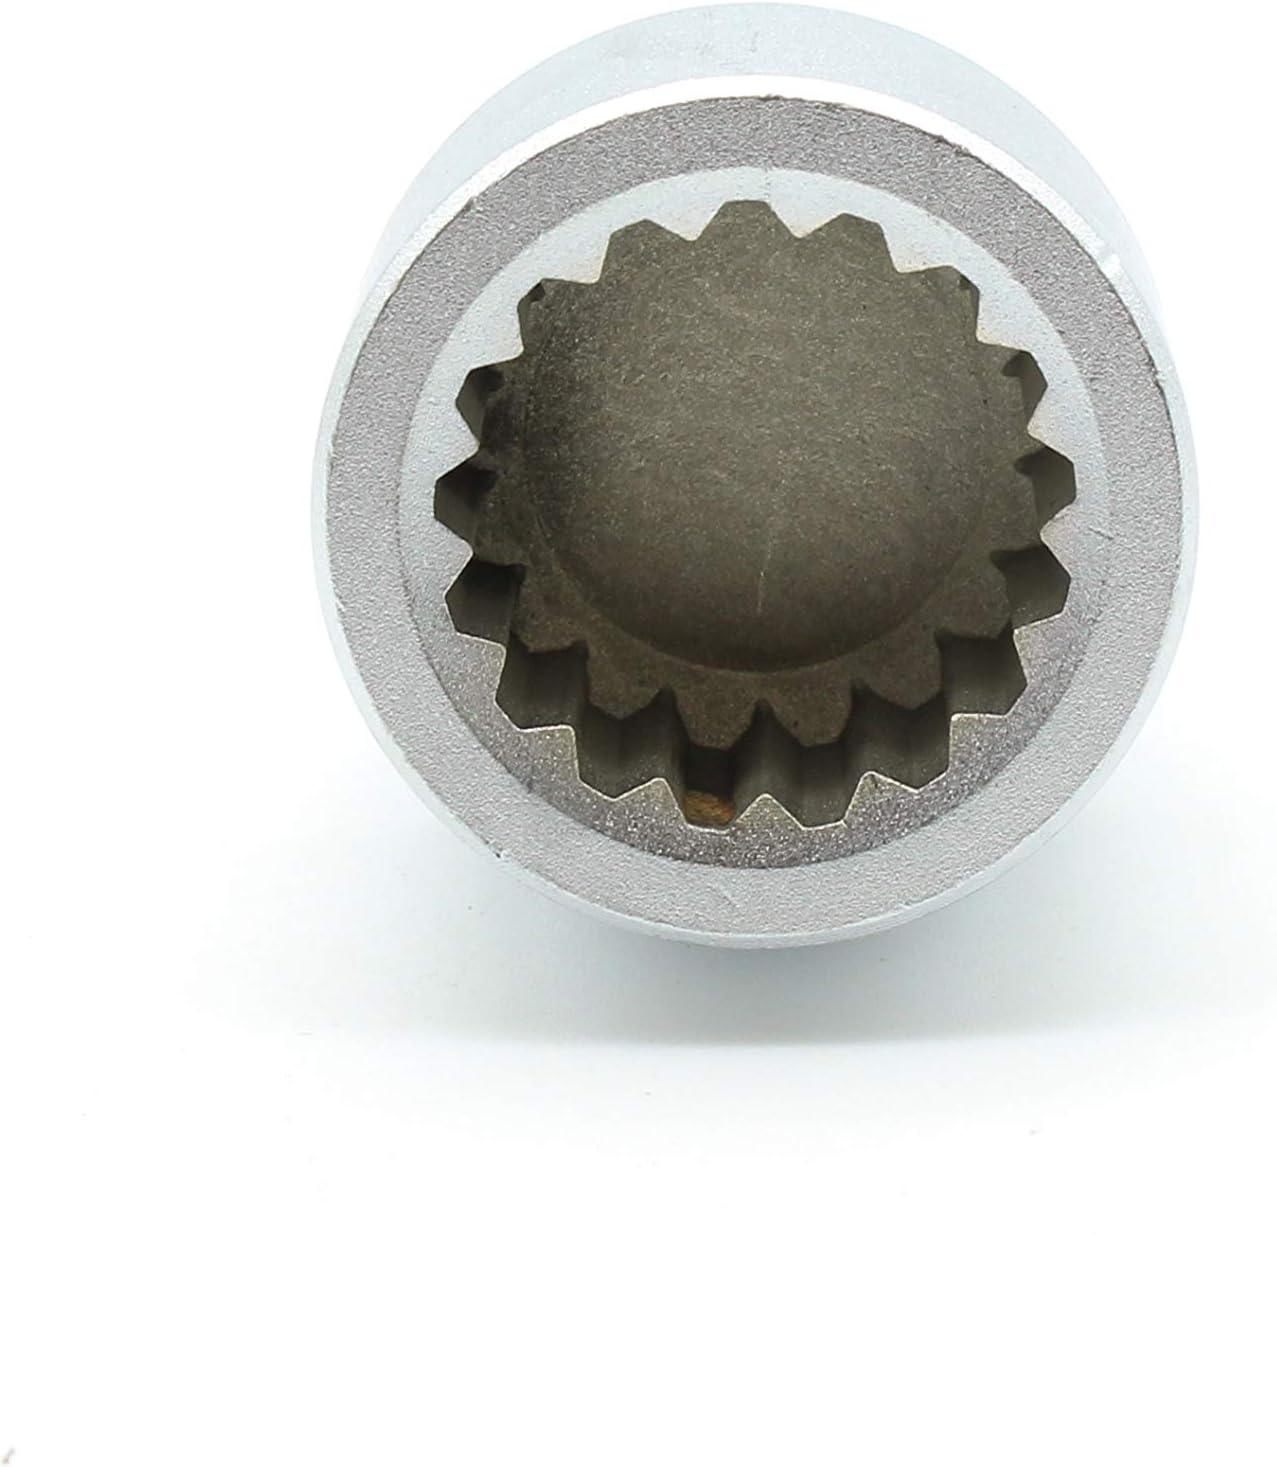 TEMO #58 Anti-Theft Wheel Lug Nut Removal Socket Key 3437 for Porsche